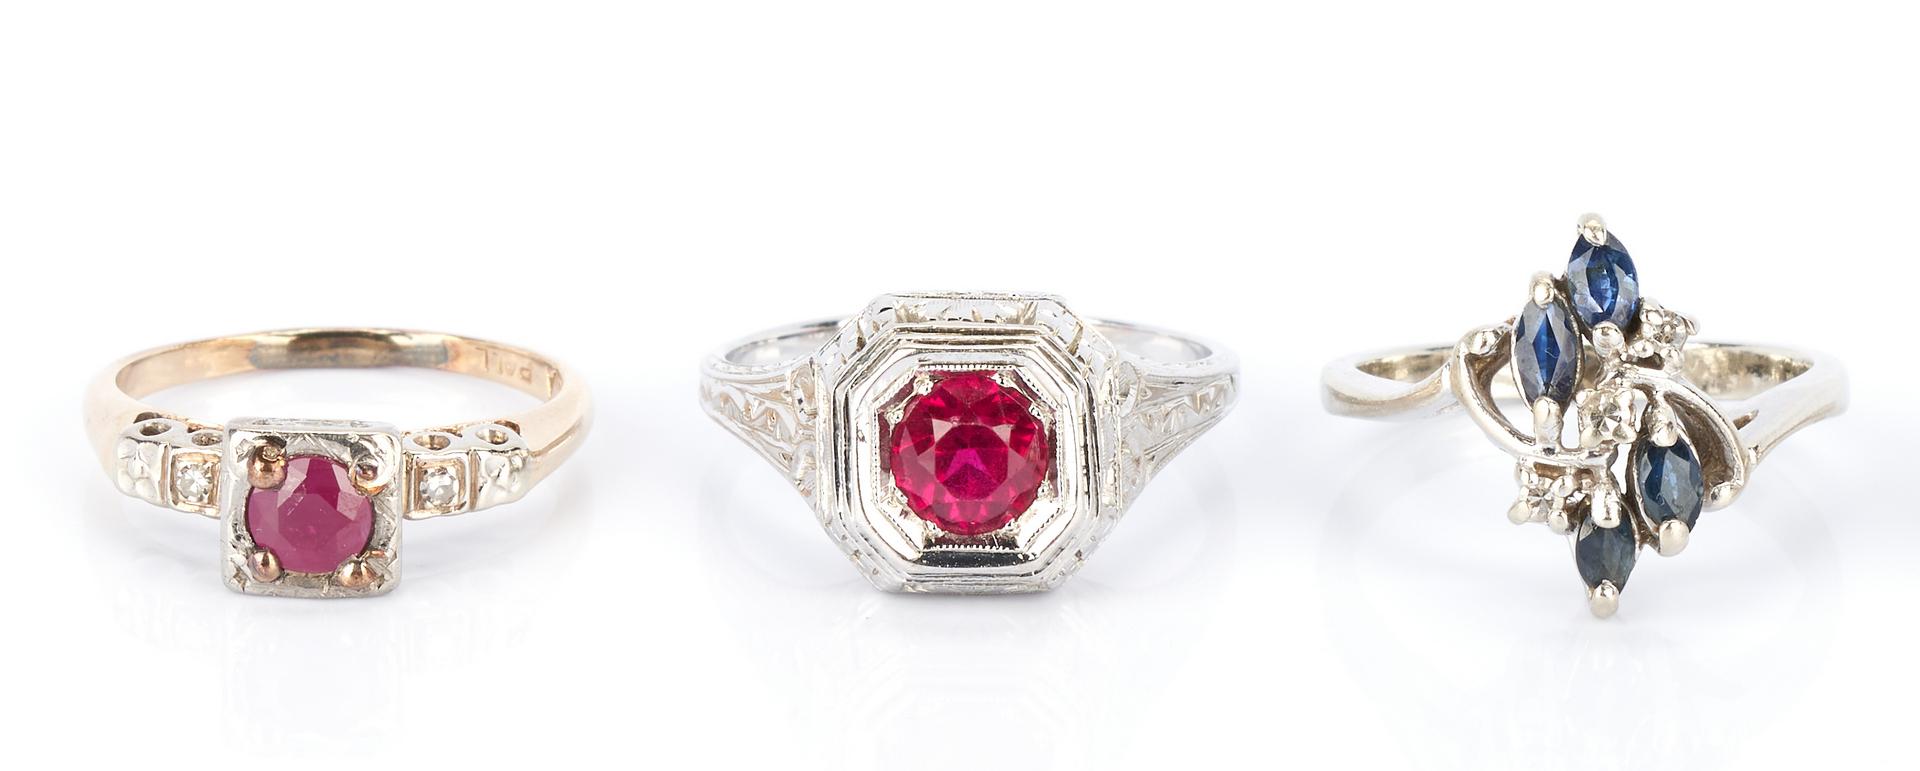 Lot 734: 6 Ladies Gold, Diamond, and Gemstone Rings